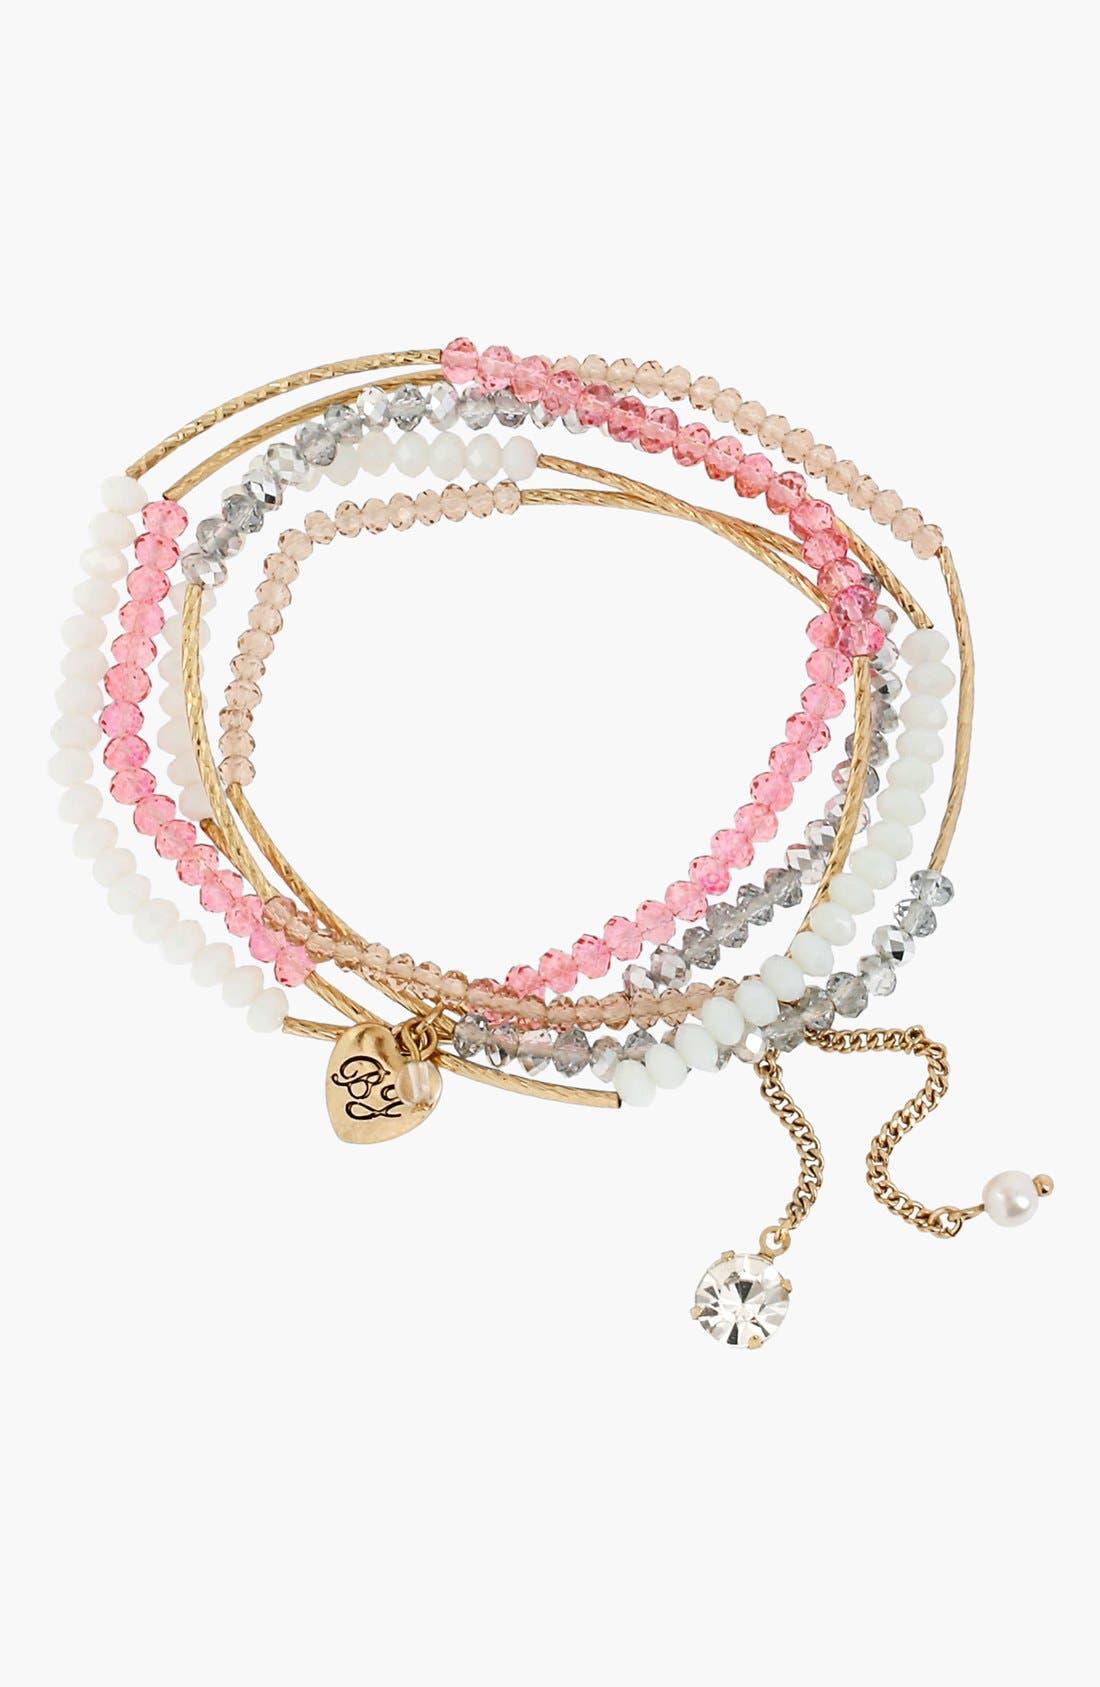 Alternate Image 1 Selected - Betsey Johnson 'Paris' Multi Row Beaded Charm Bracelet